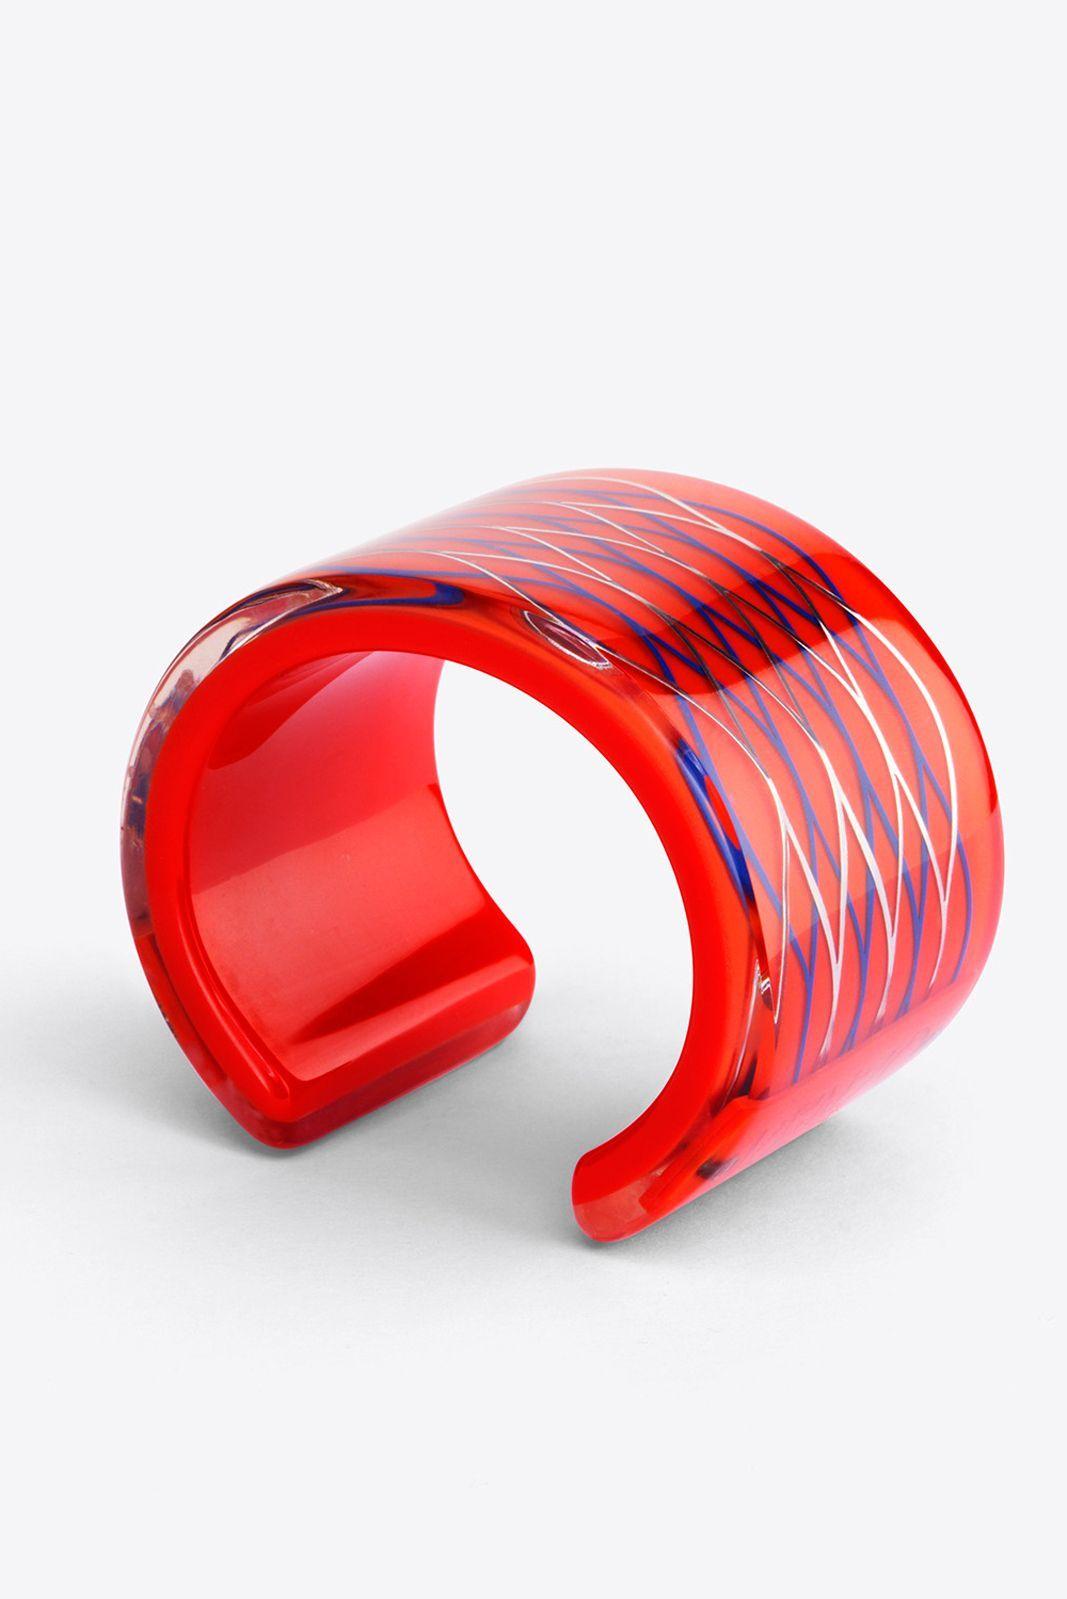 H&M x Kenzo Bracelet, $49.99, available on November 3 at H&M.